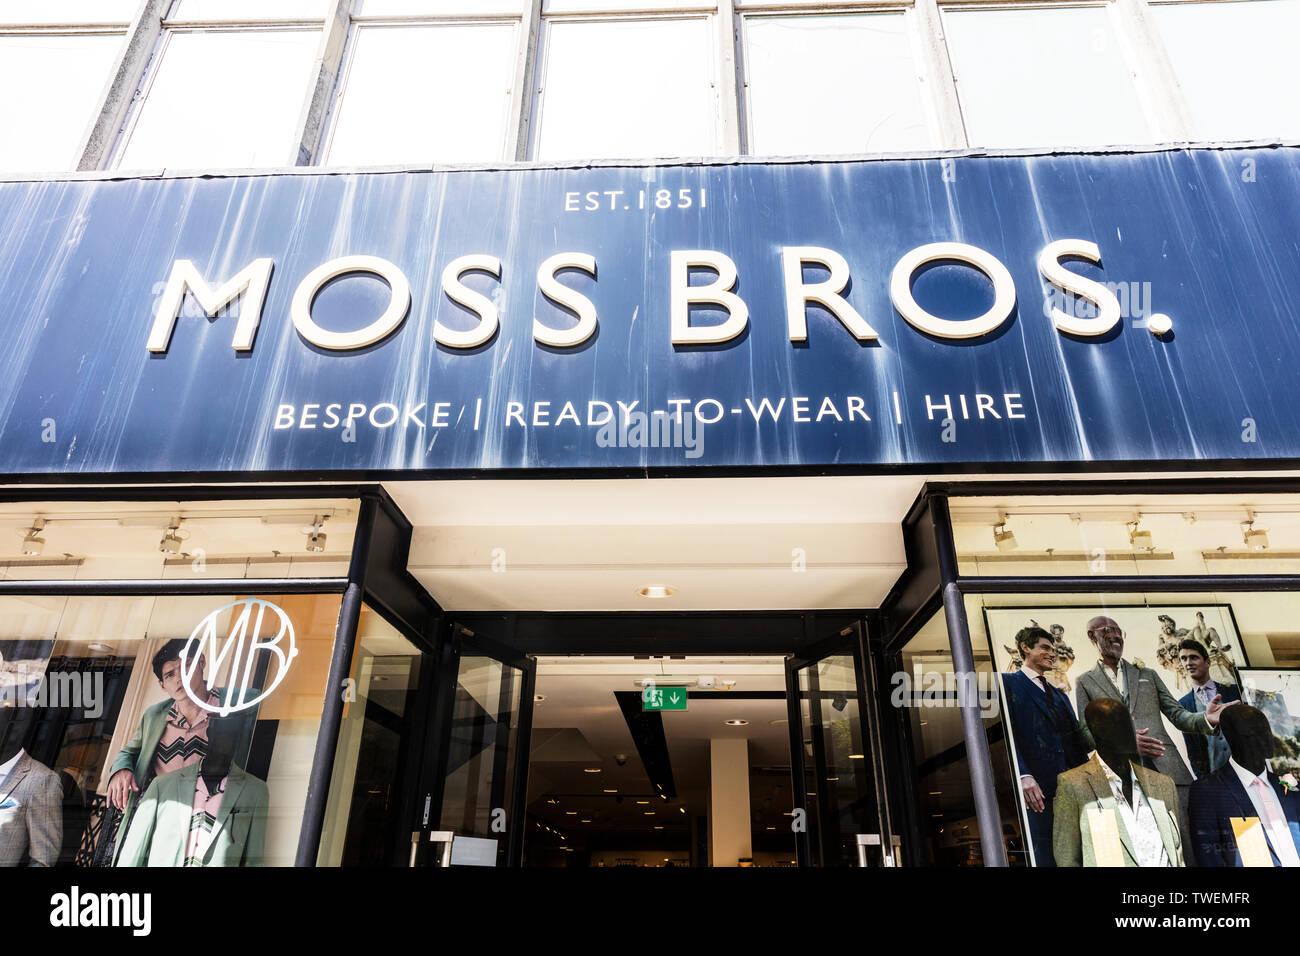 Moss Bros fashion store, Plymouth, Devon, UK, England, Moss Bros menswear, Moss Bros sign, Moss Bros shop, Moss Bros, Moss Bros UK, Moss Bros mens - Stock Image